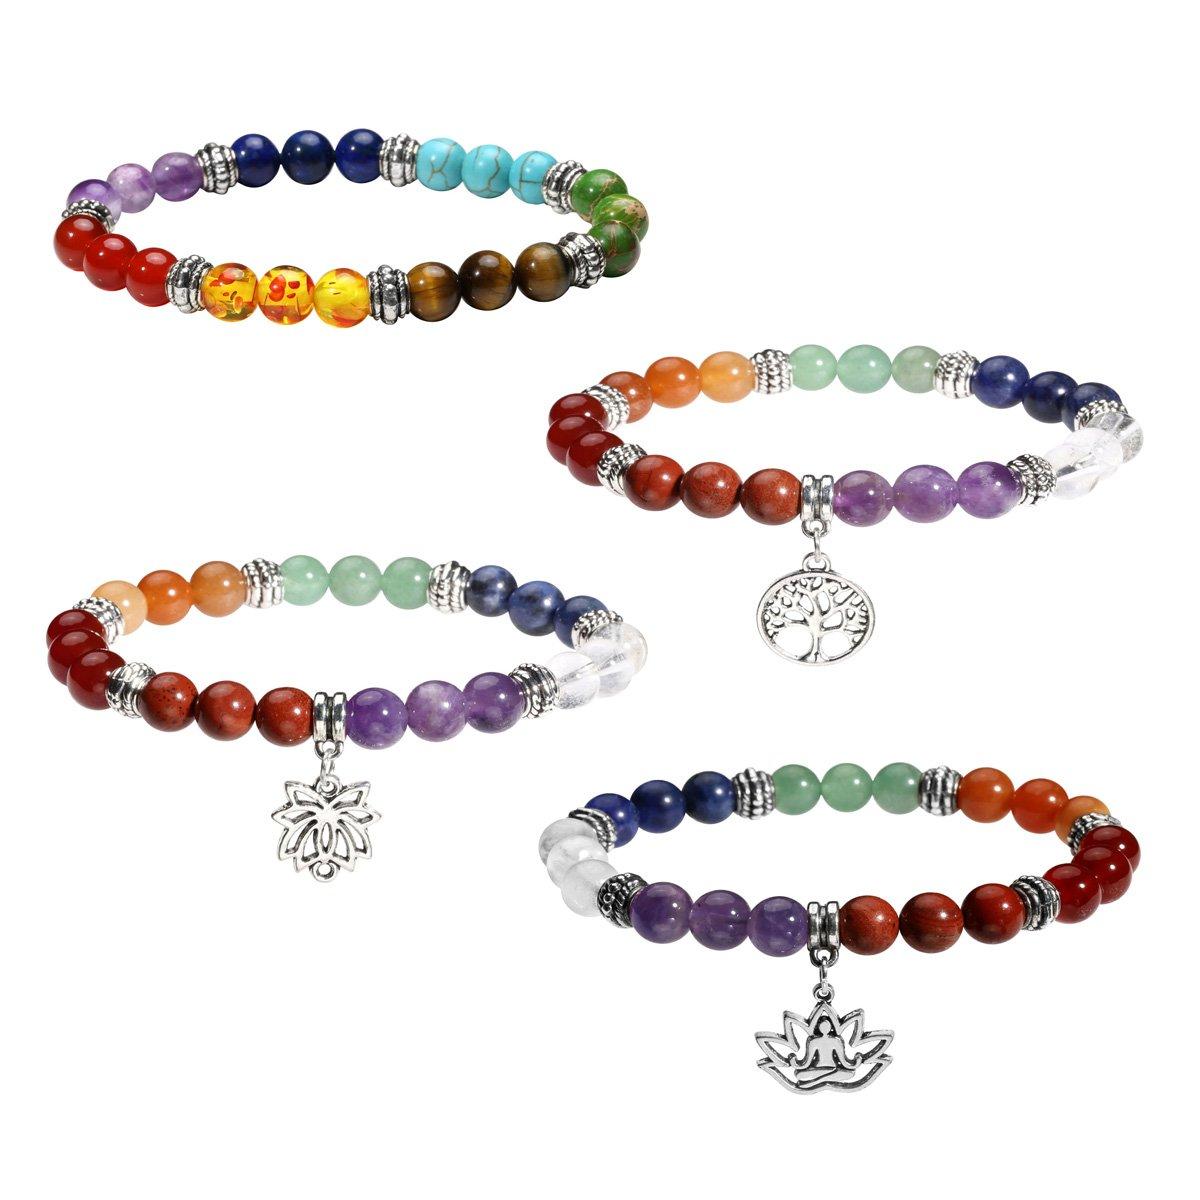 Eigso 7 Chakra Womens Reiki Healing Meditation Crystal Stone Stretch Bracelet with Lotus/Yoga/Tree/OM Symbol Sign EGBRCO00062